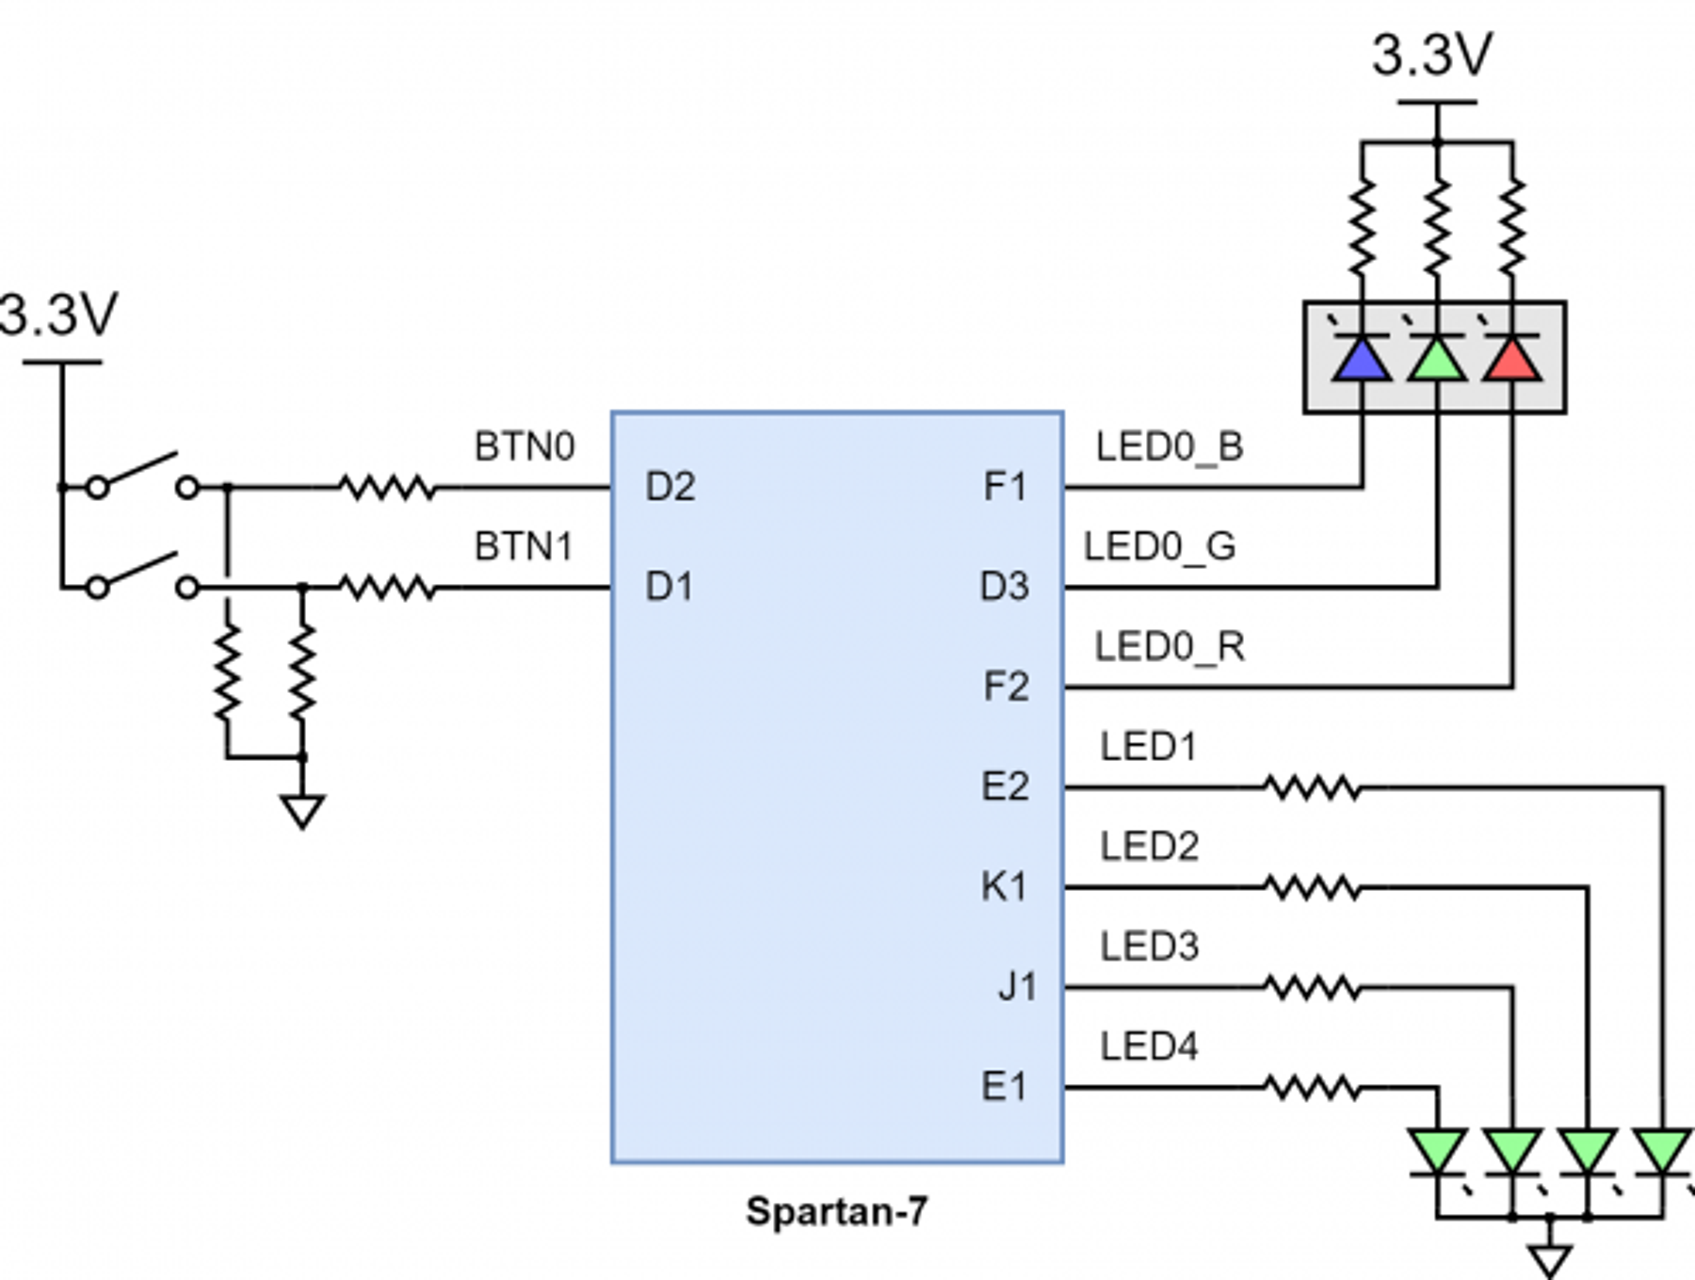 Figure 5.1 PLTW S7 Basic I/O